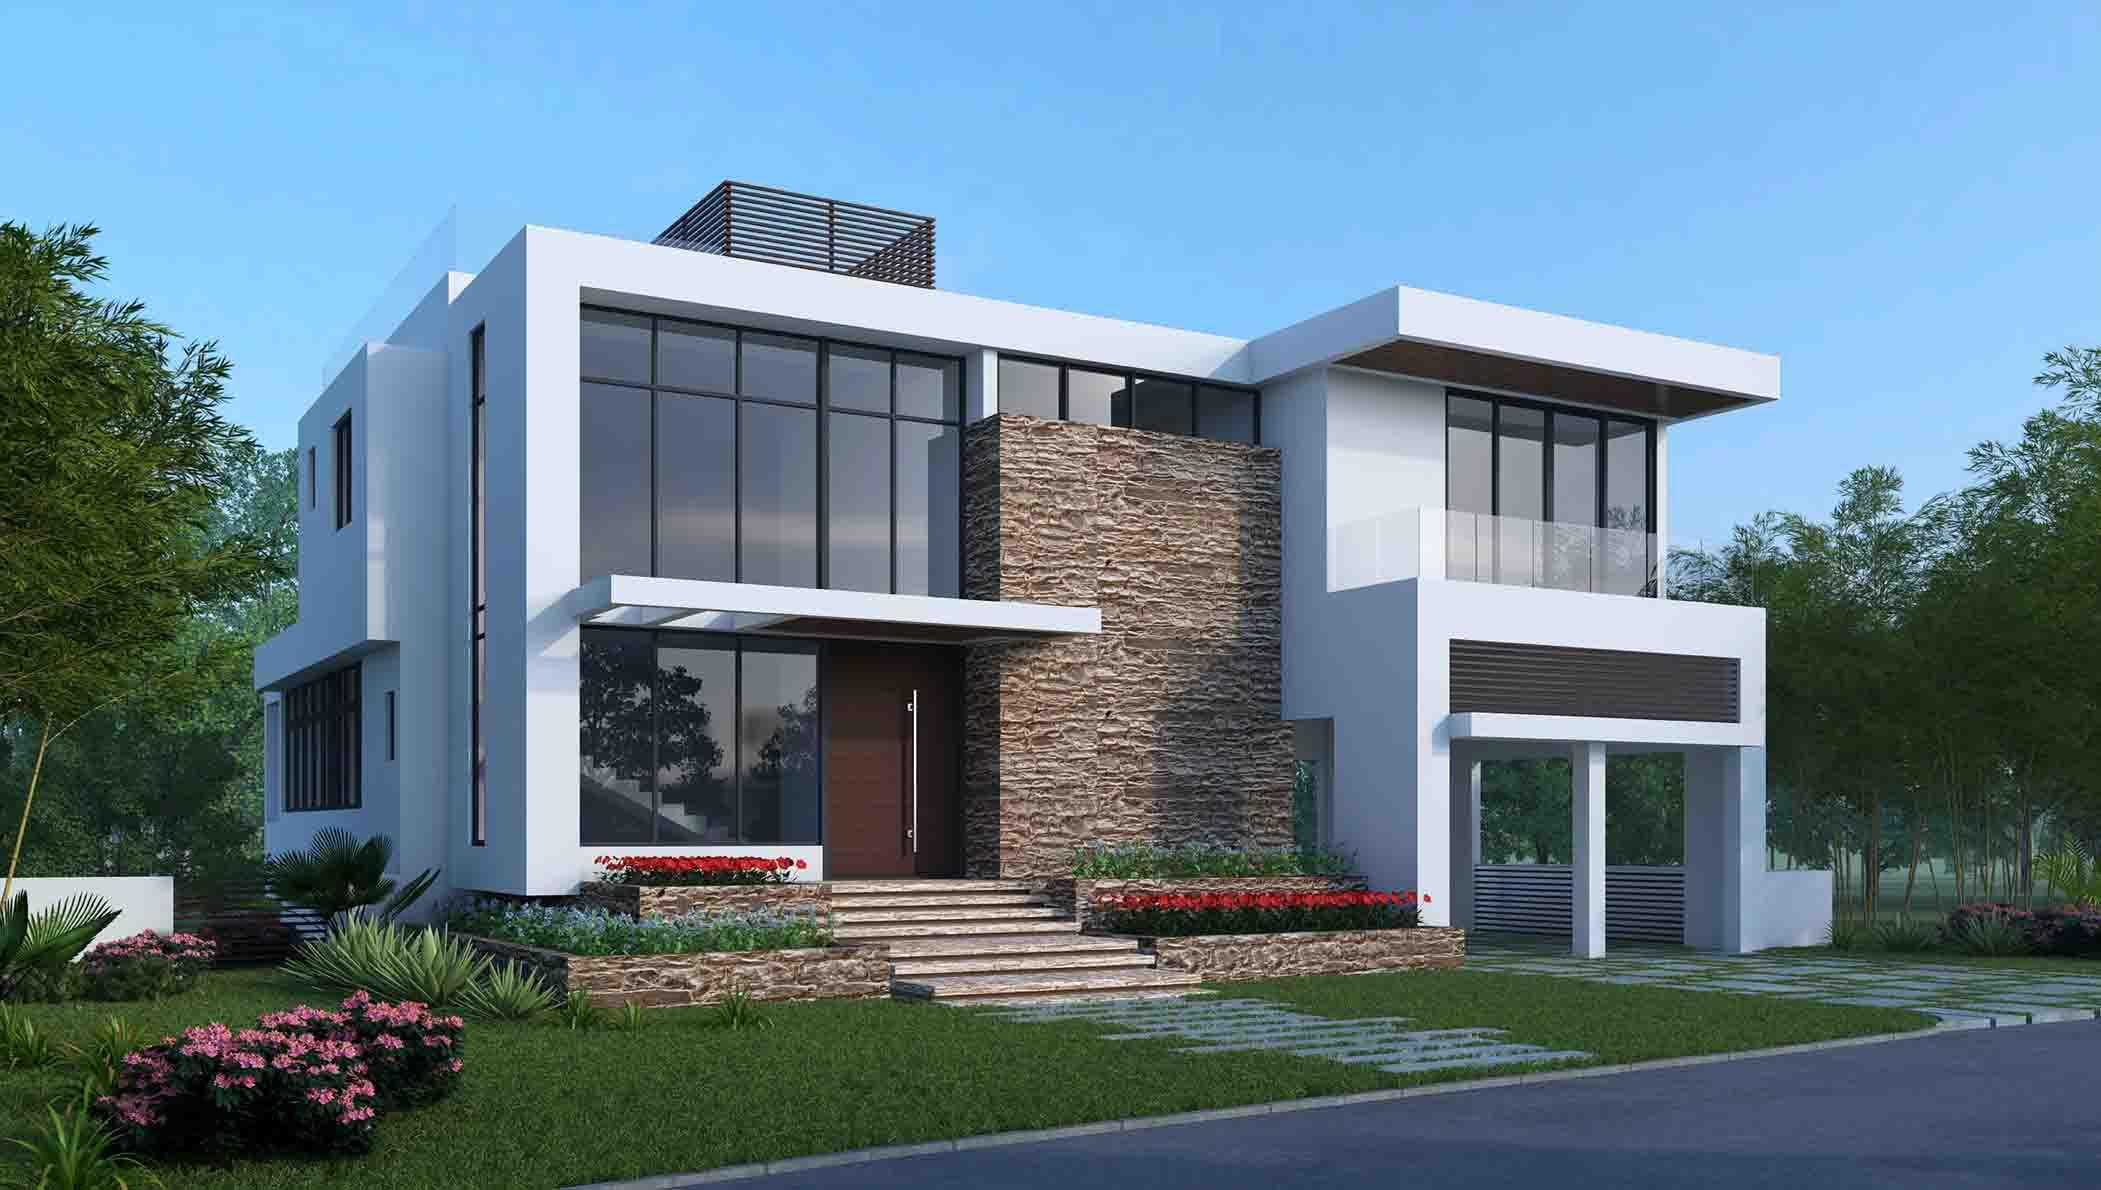 Miami home design llc miami home design llc 28 images for Home designs llc